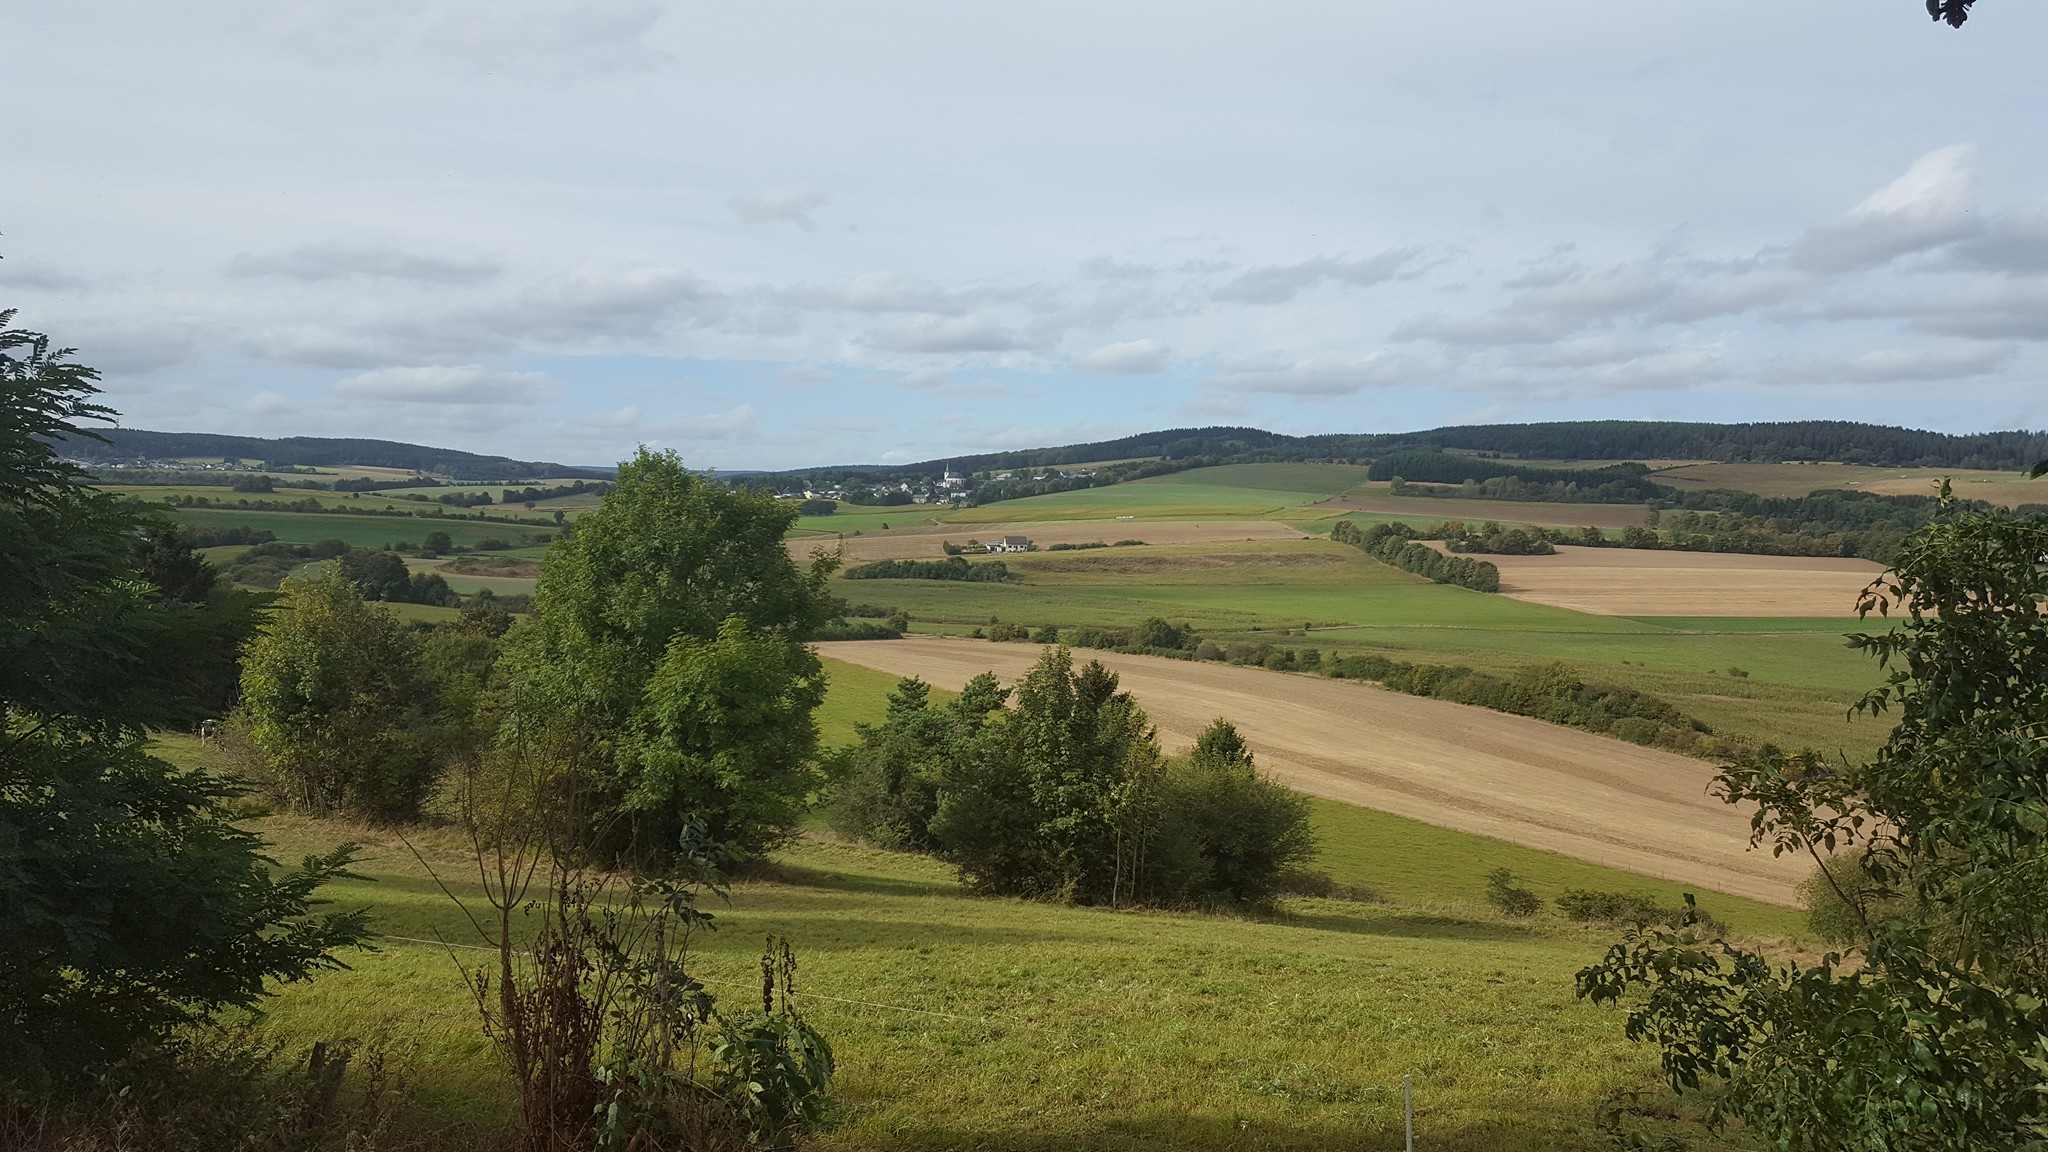 Willy-Hounjet-Wallersheim-Eifel---(3)